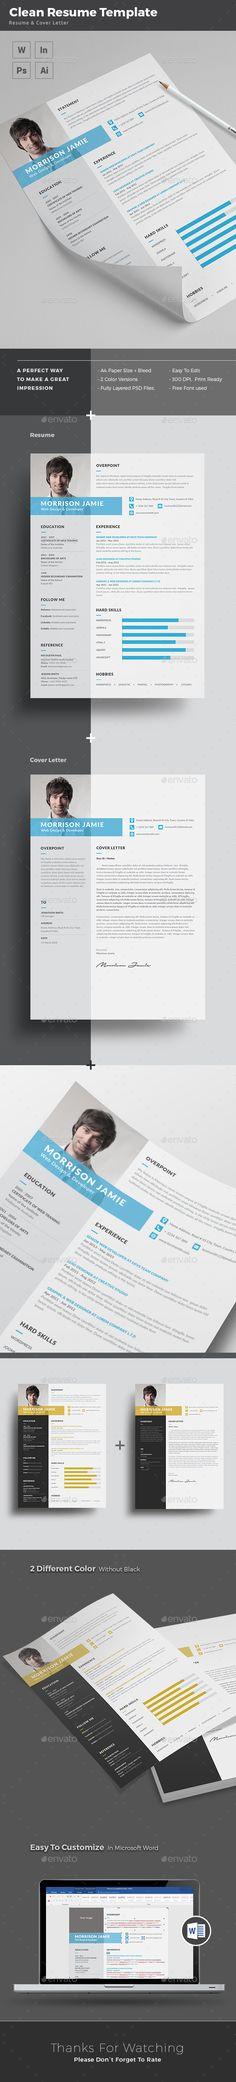 Resume  — PSD Template #resume creative #resume portfolio • Download ➝ https://graphicriver.net/item/resume/15355494?ref=pxcr